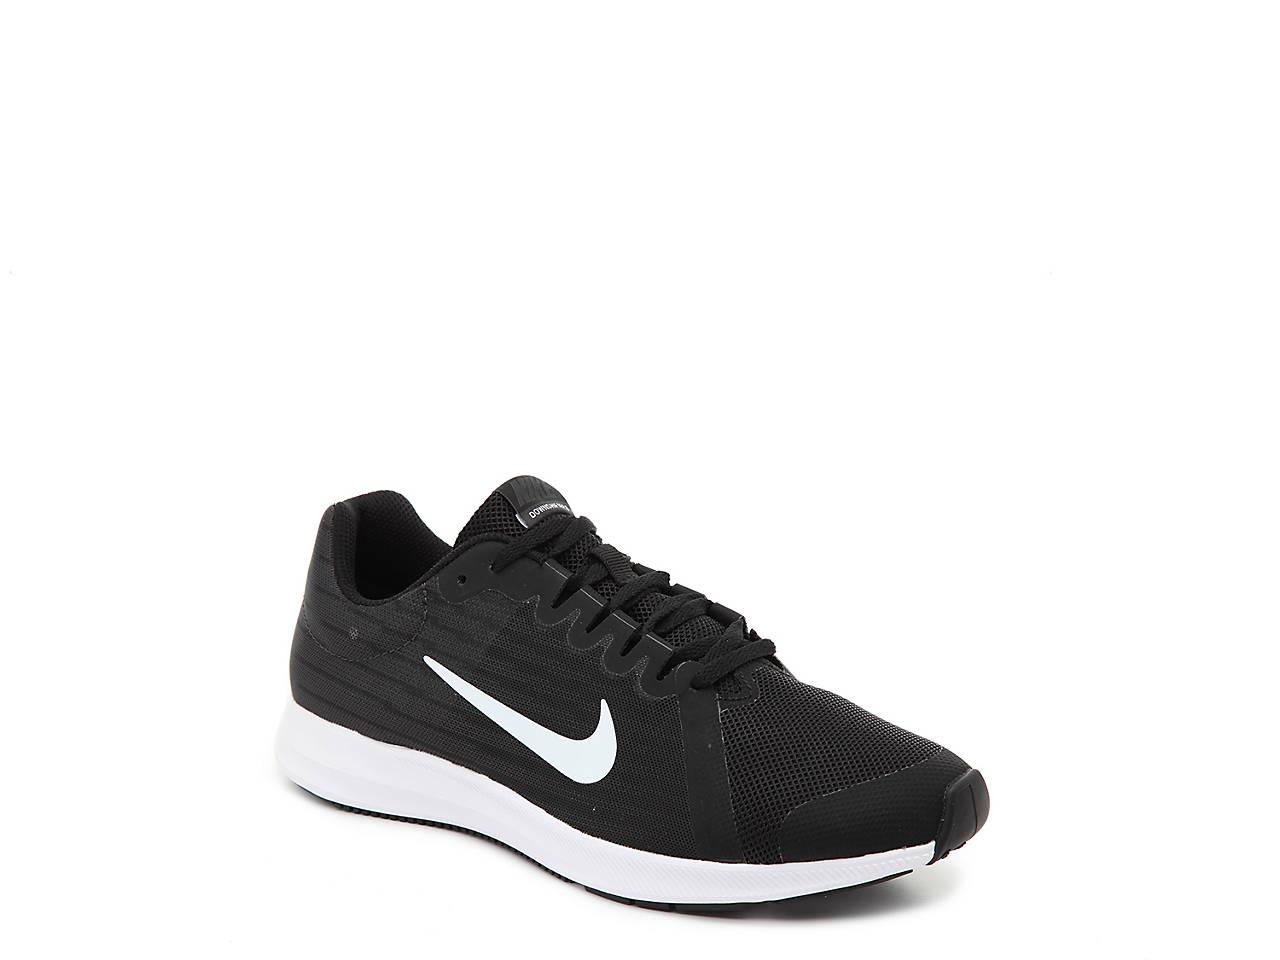 4ca973908 Nike Downshifter 8 Youth Running Shoe Kids Shoes | DSW